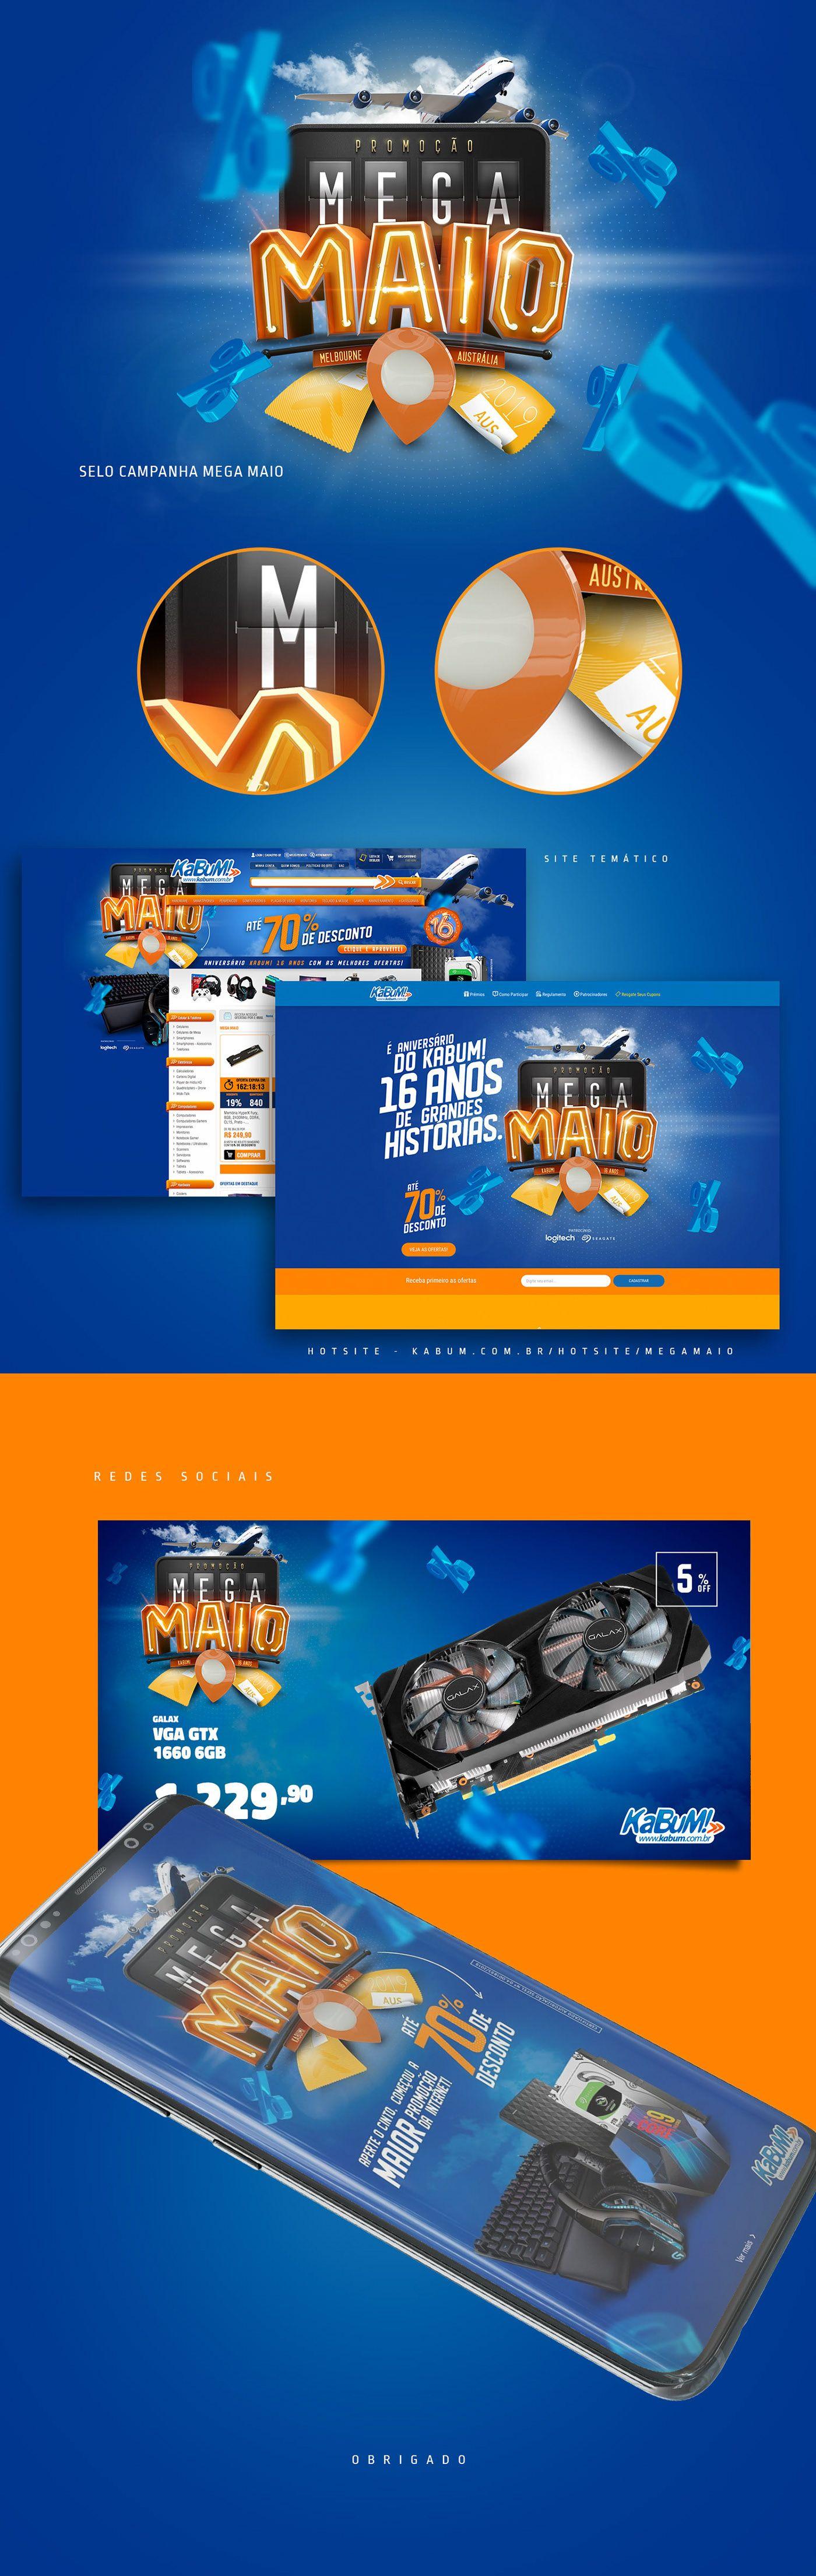 Campanha Mega Maio Kabum On Behance Behance Adobe Creative Cloud Adobe Creative